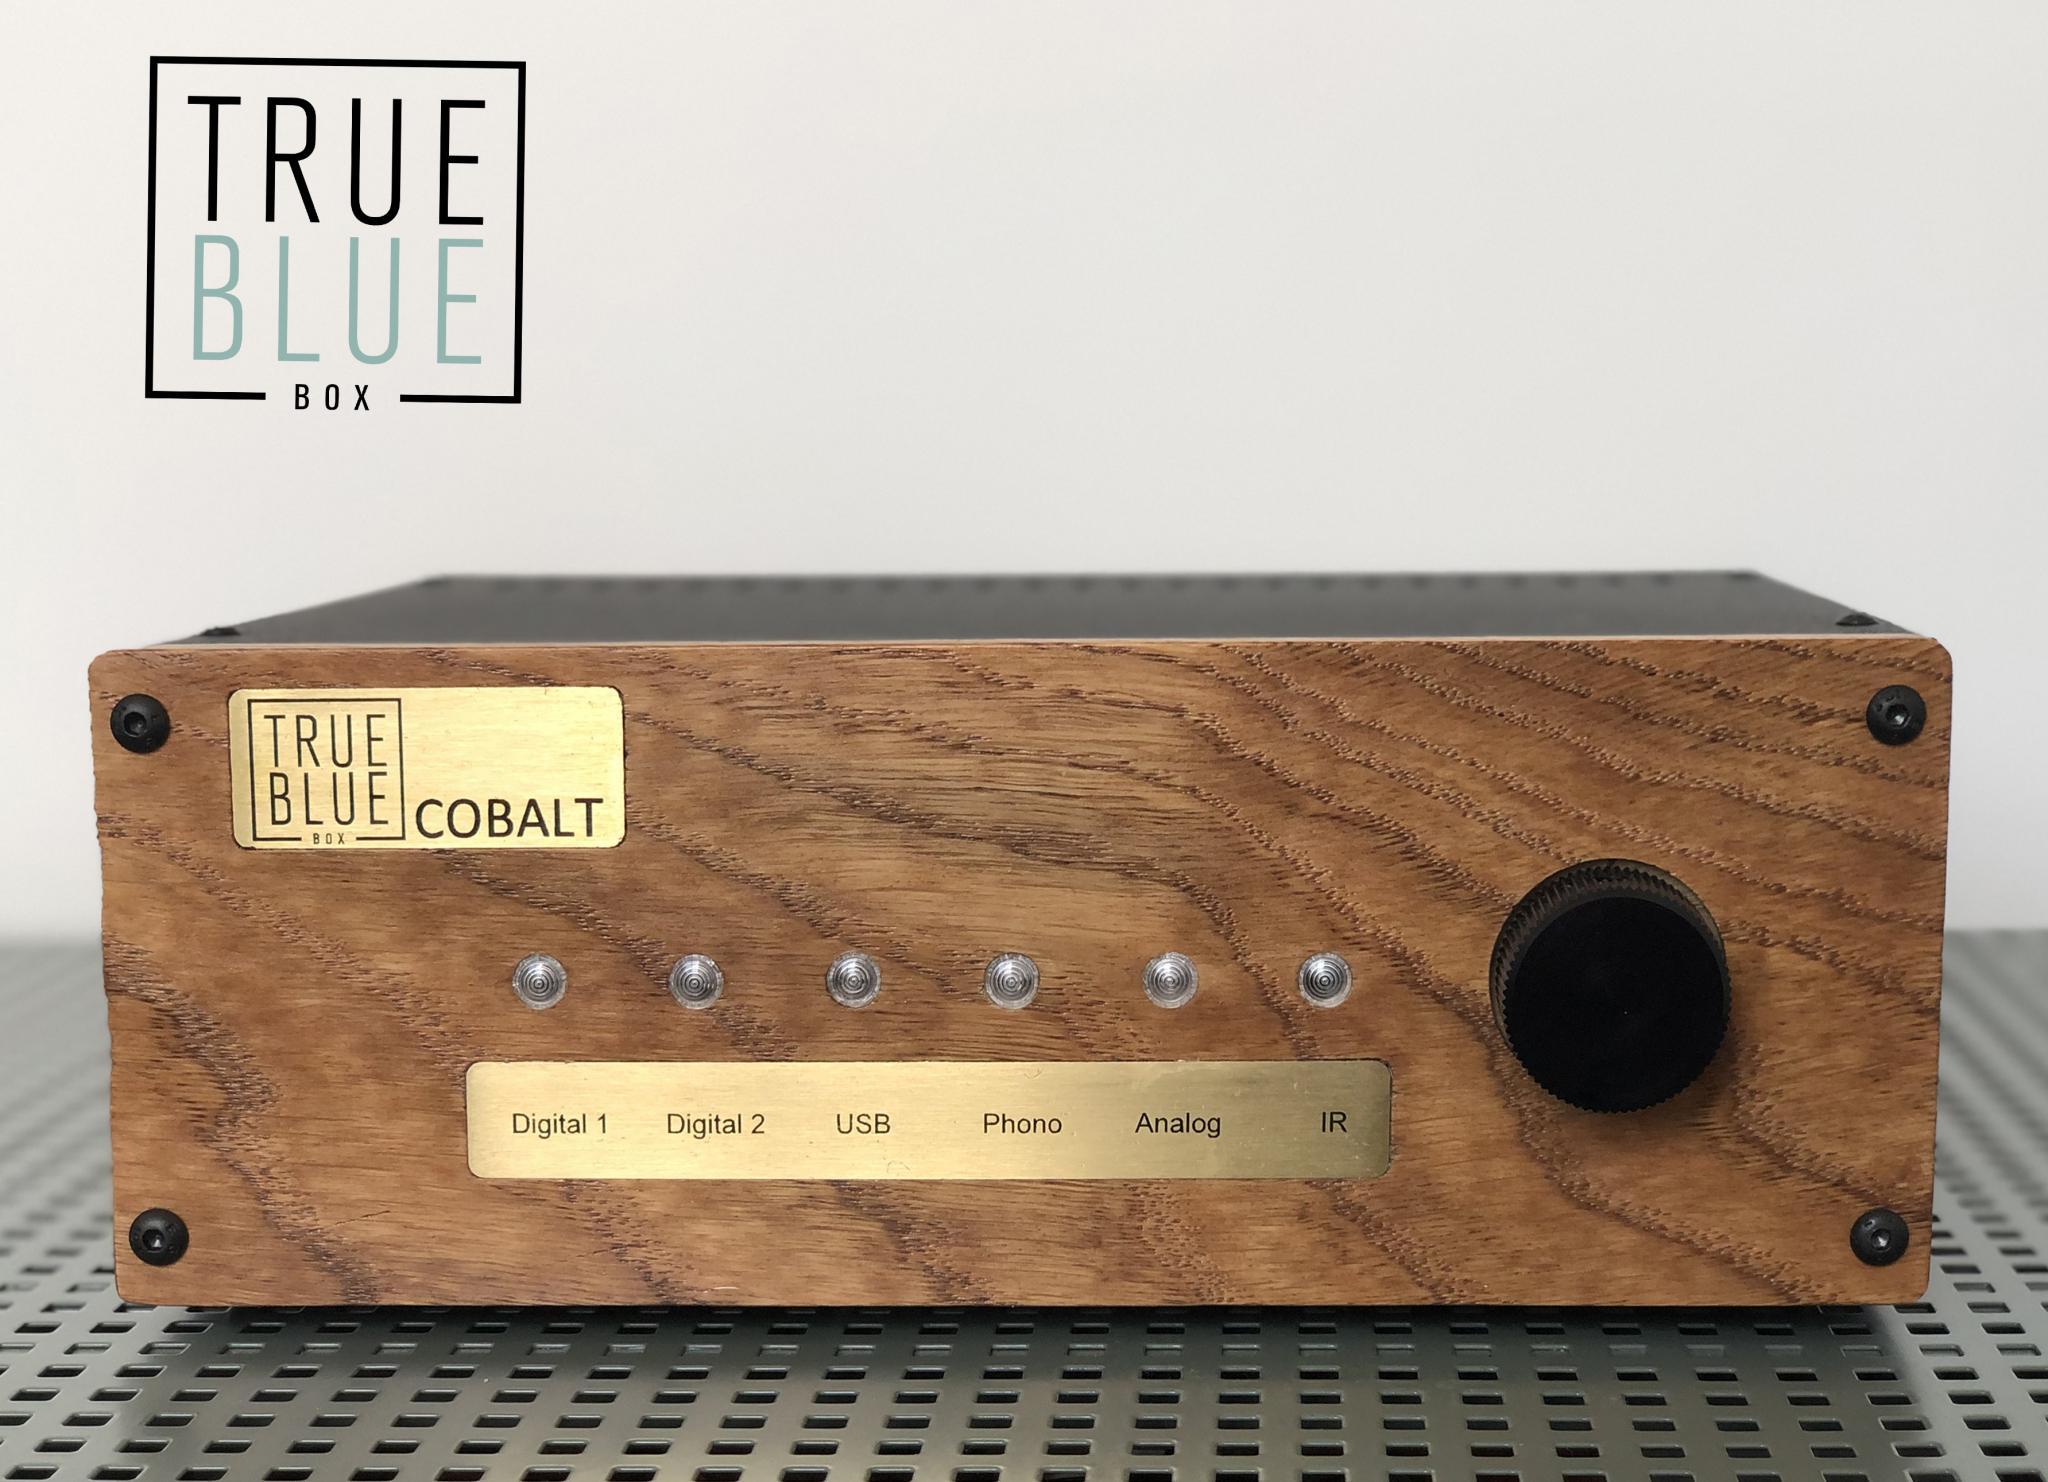 True Blue Box COBALT DA 18